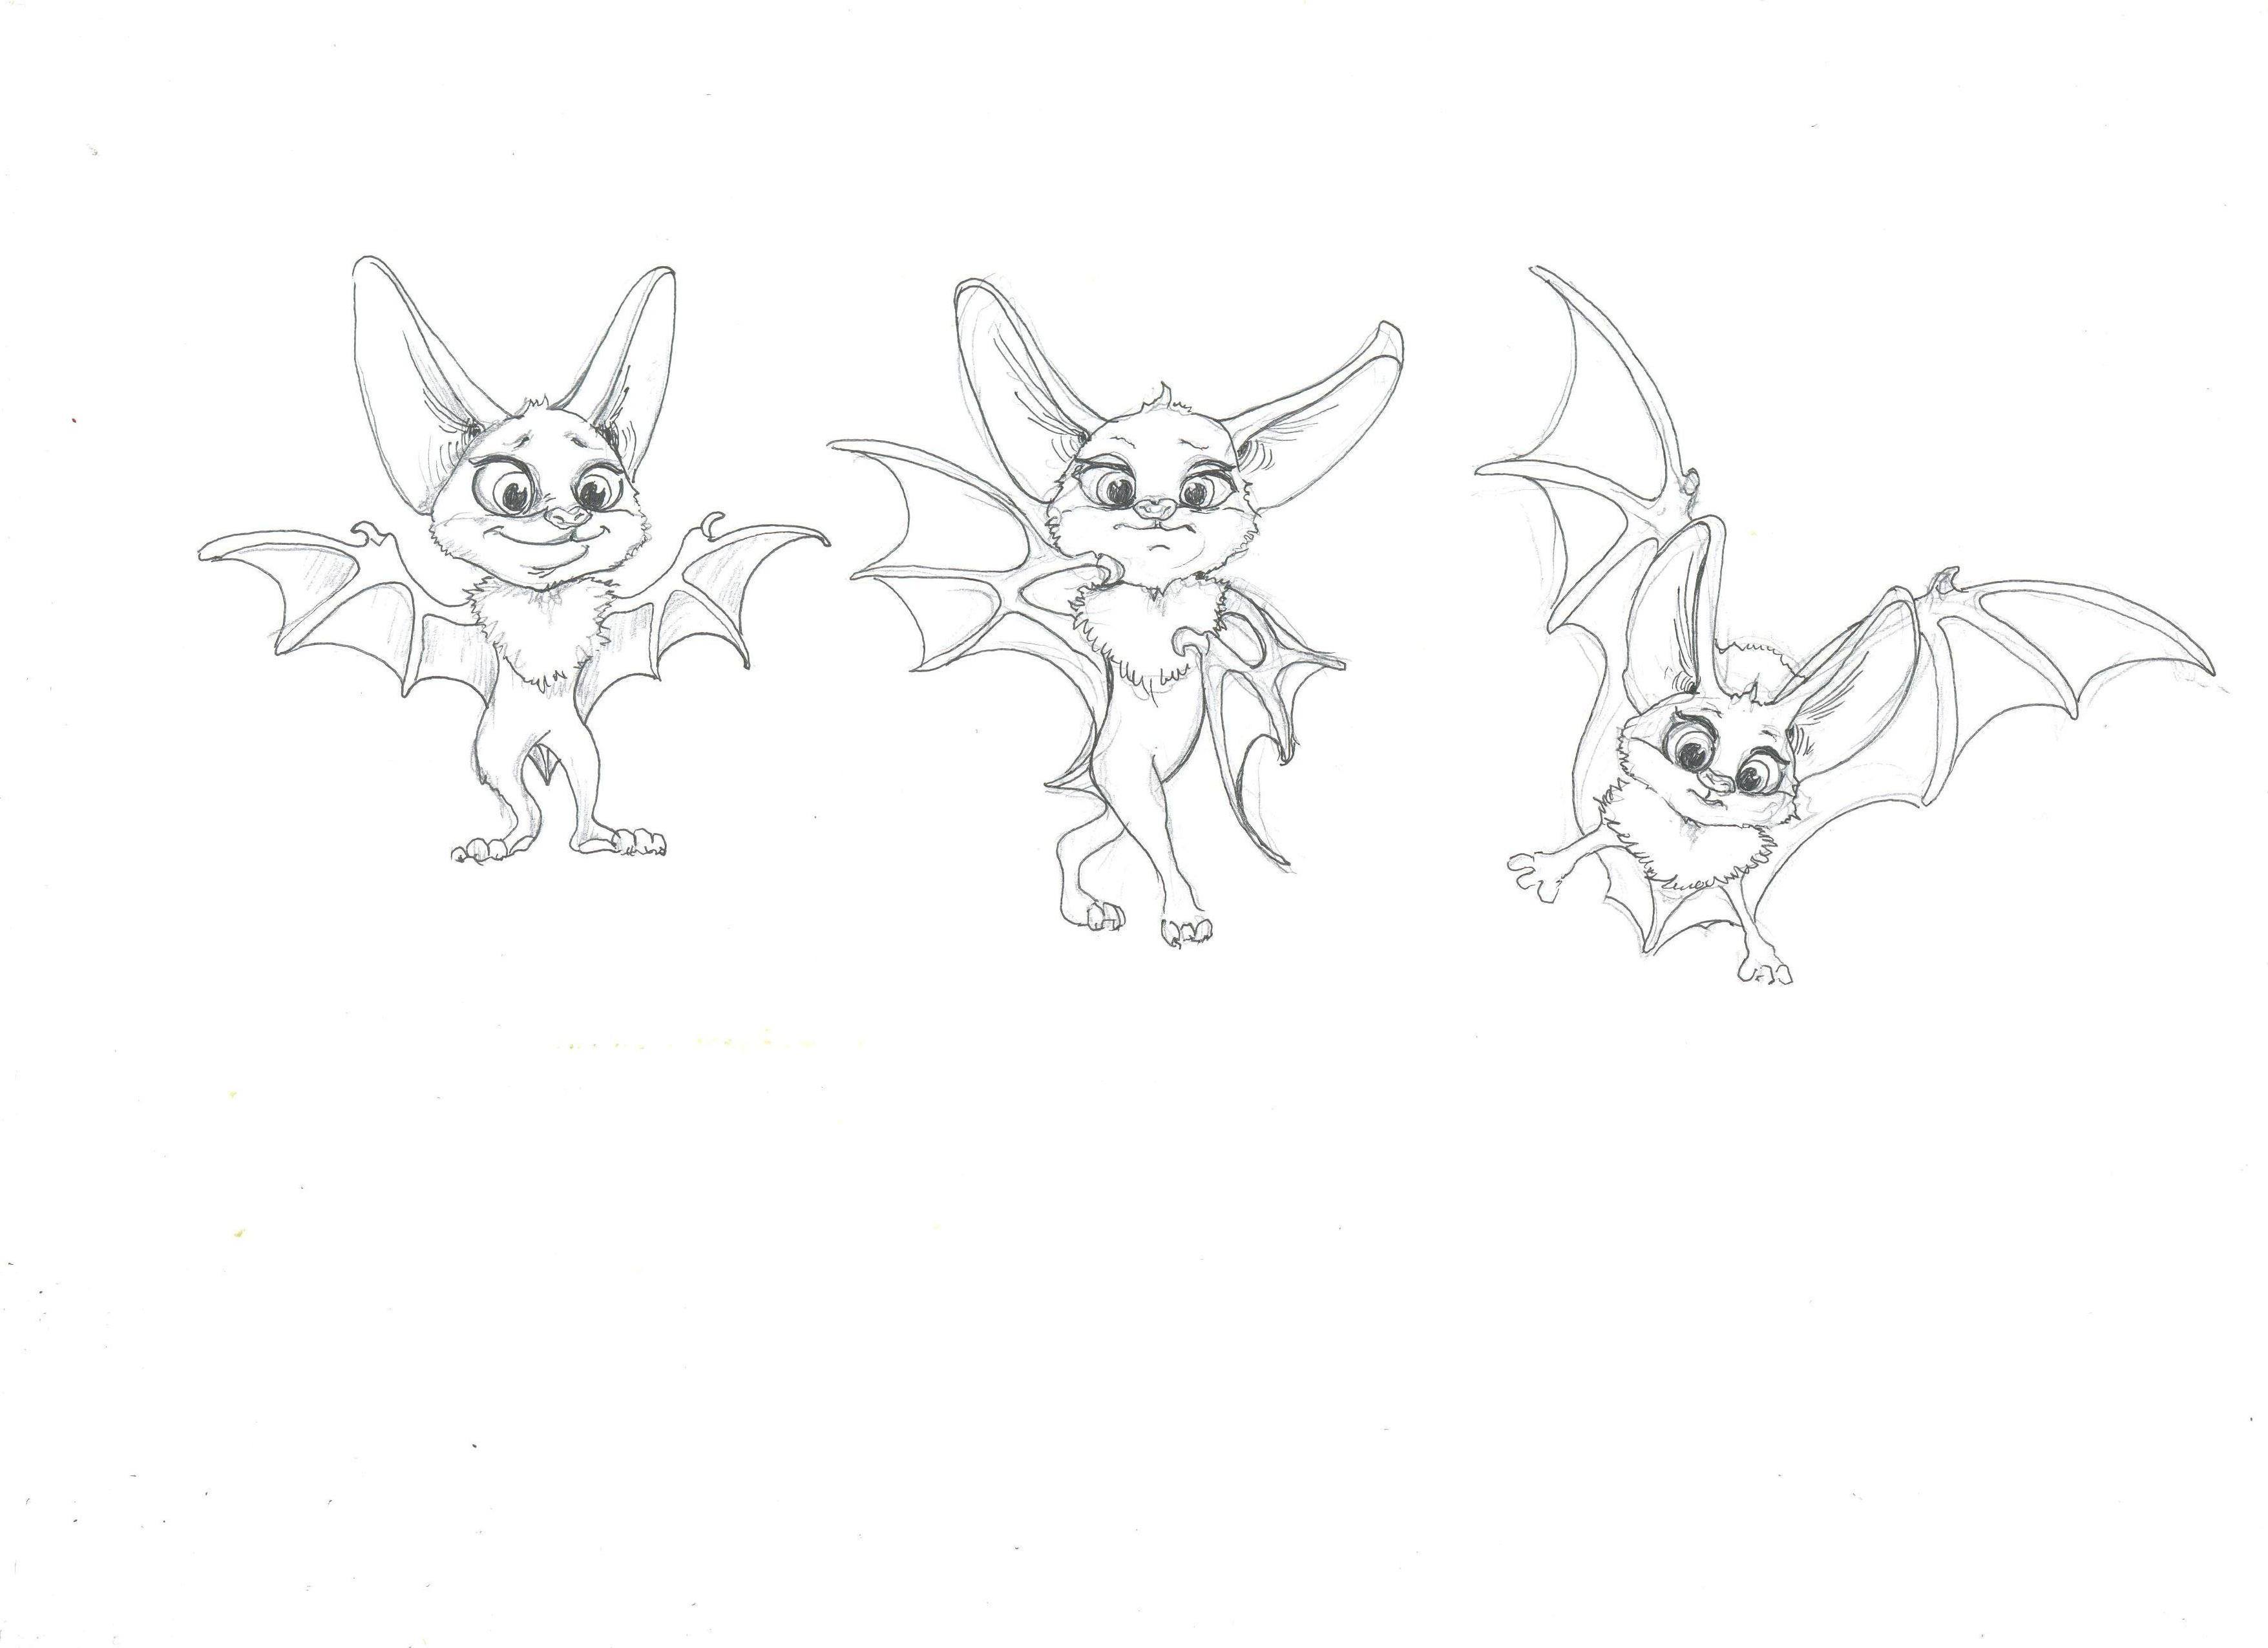 Нарисовать персонажа для анимации фото f_2165c8b763a9f021.jpg